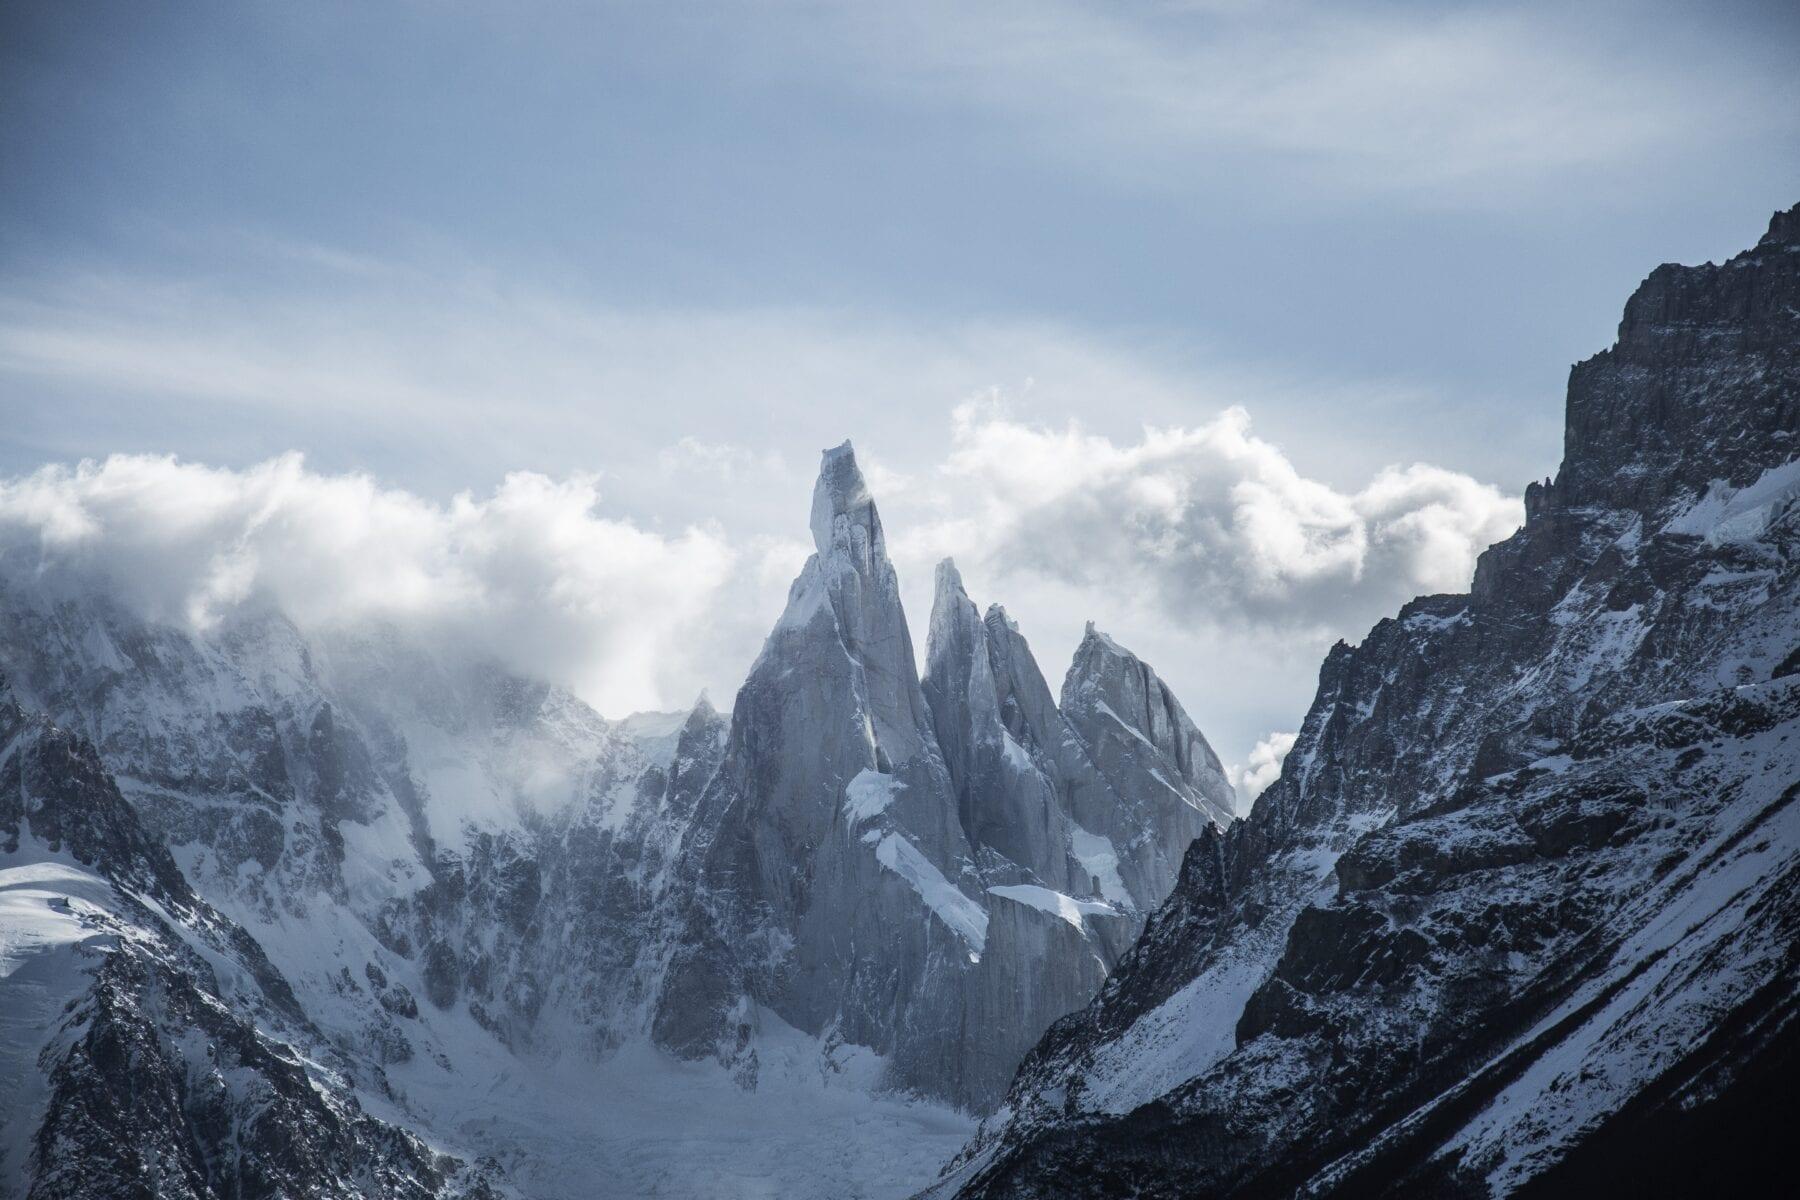 Patagonie bergen